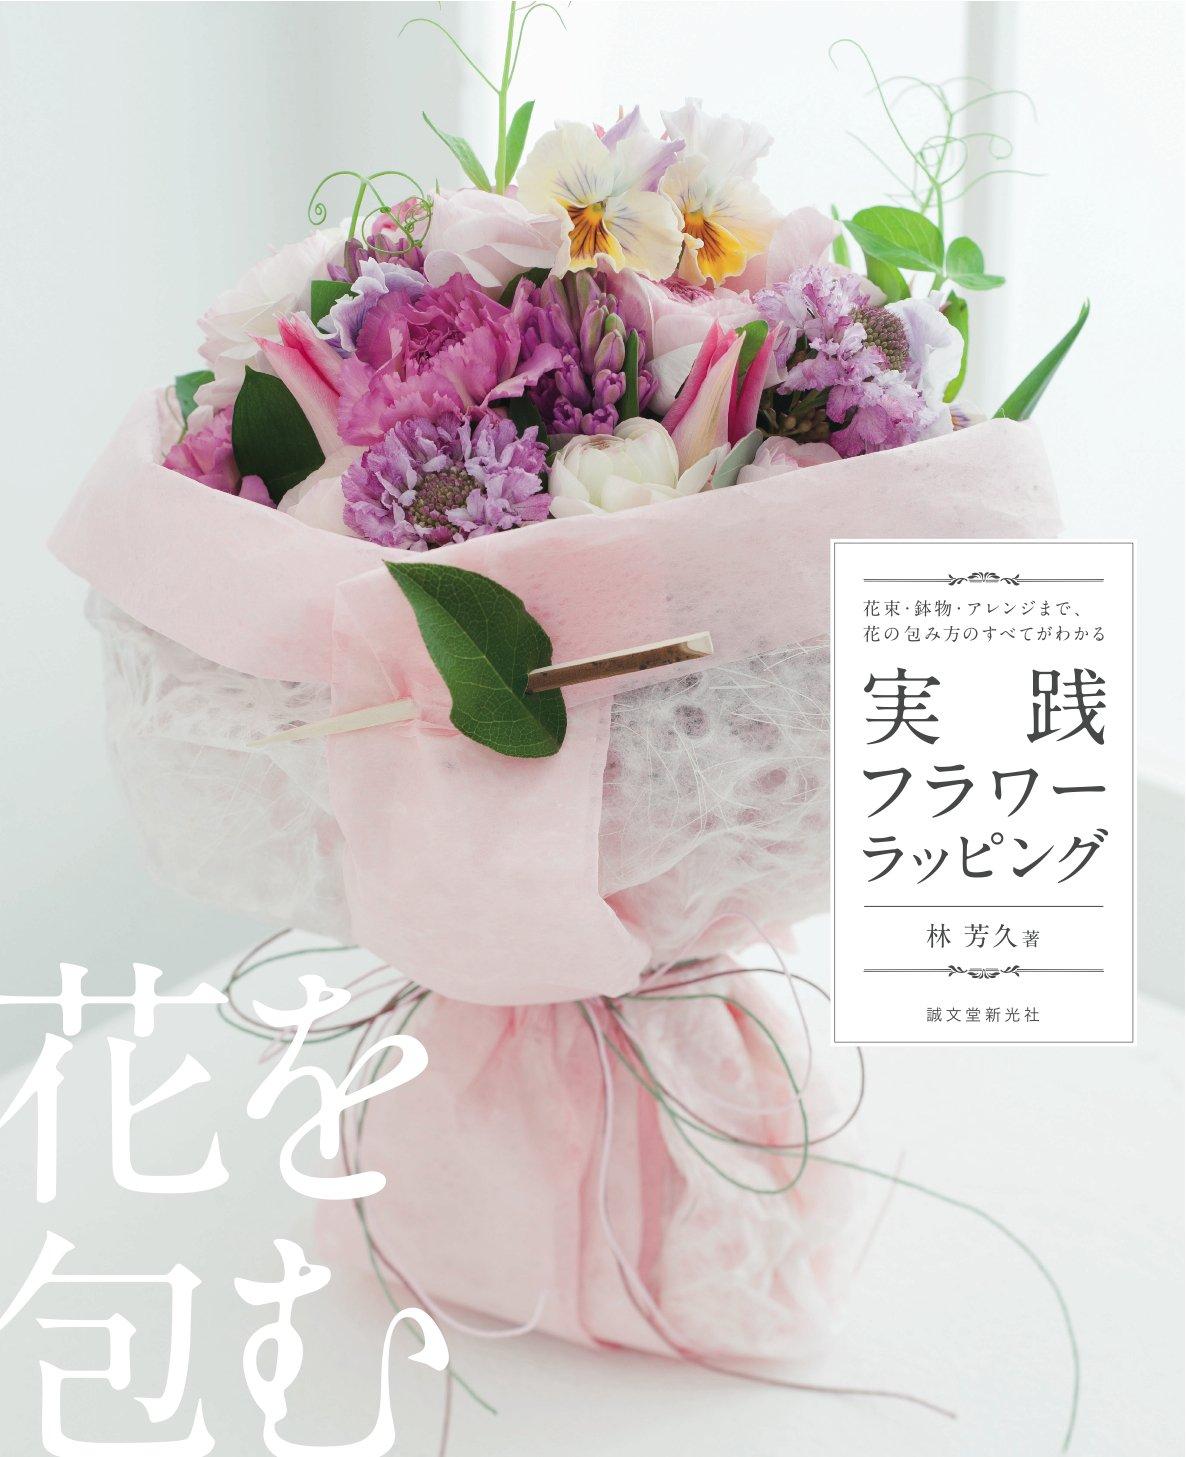 Practice Flower wrapping by Yoshihisa Hayashi